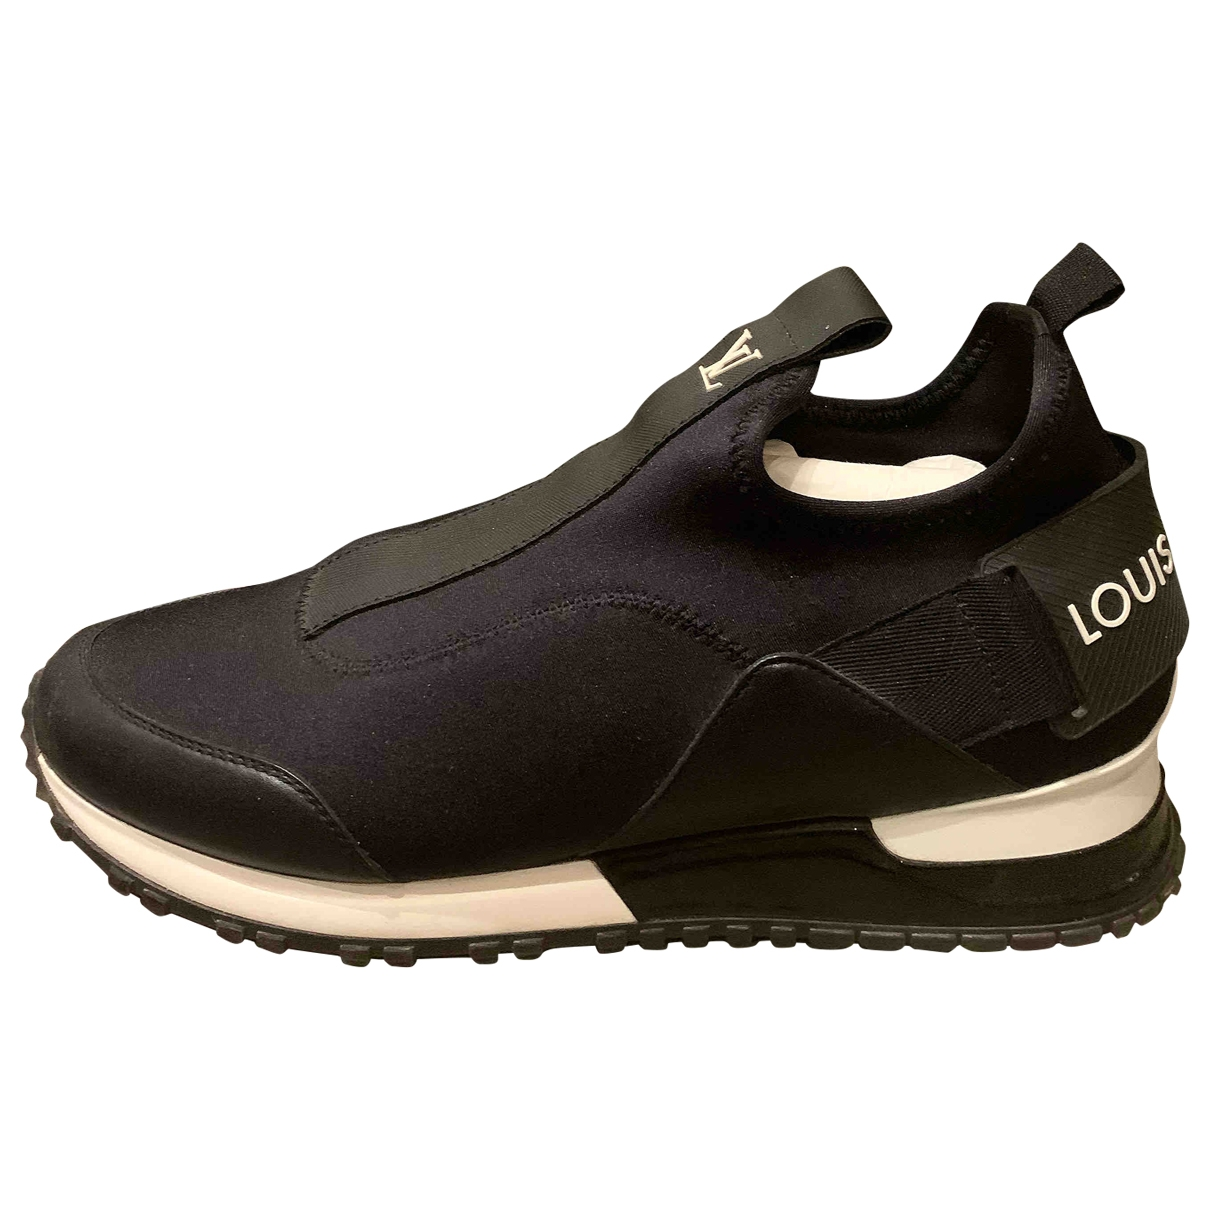 Deportivas de Lona Louis Vuitton